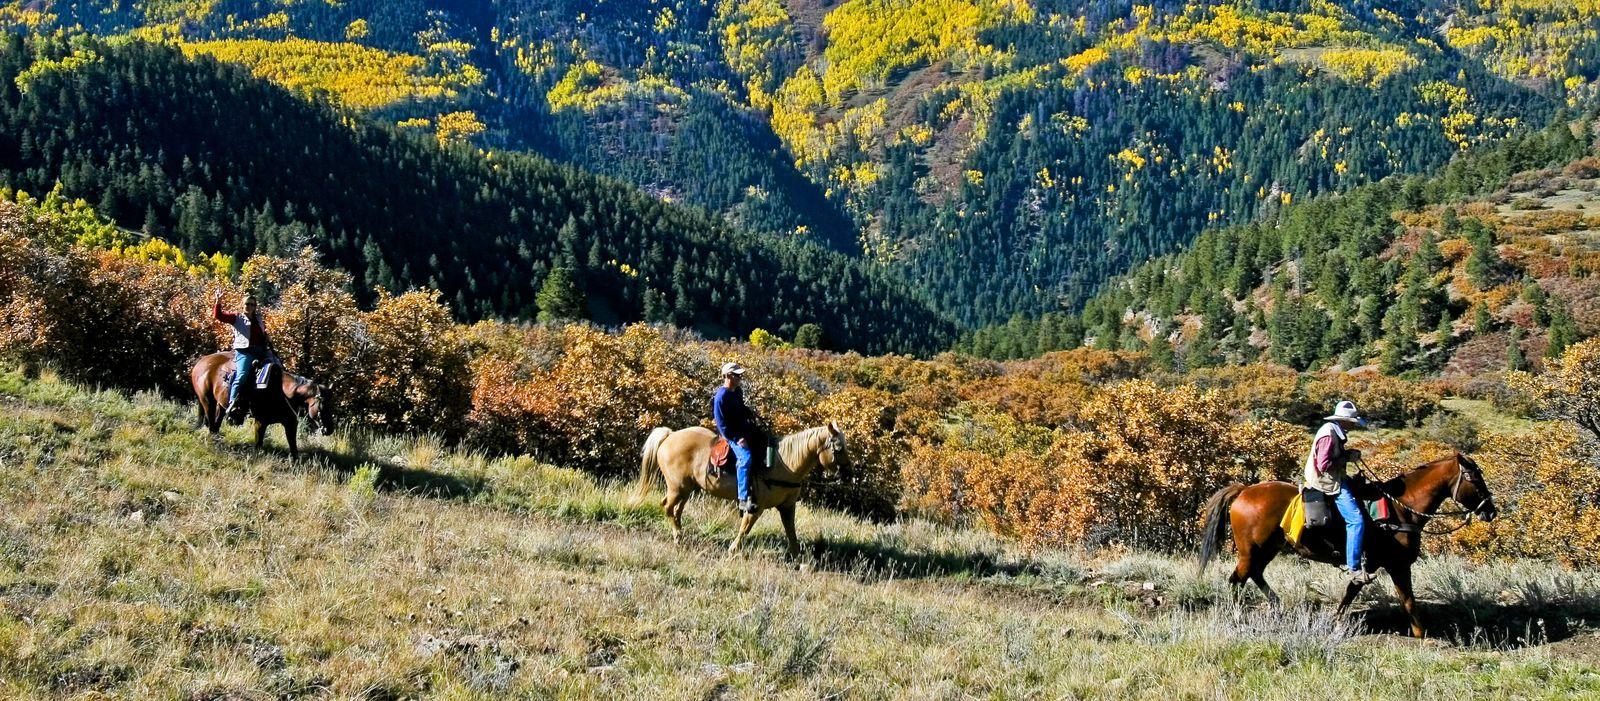 Reiten in Aspen, Colorado